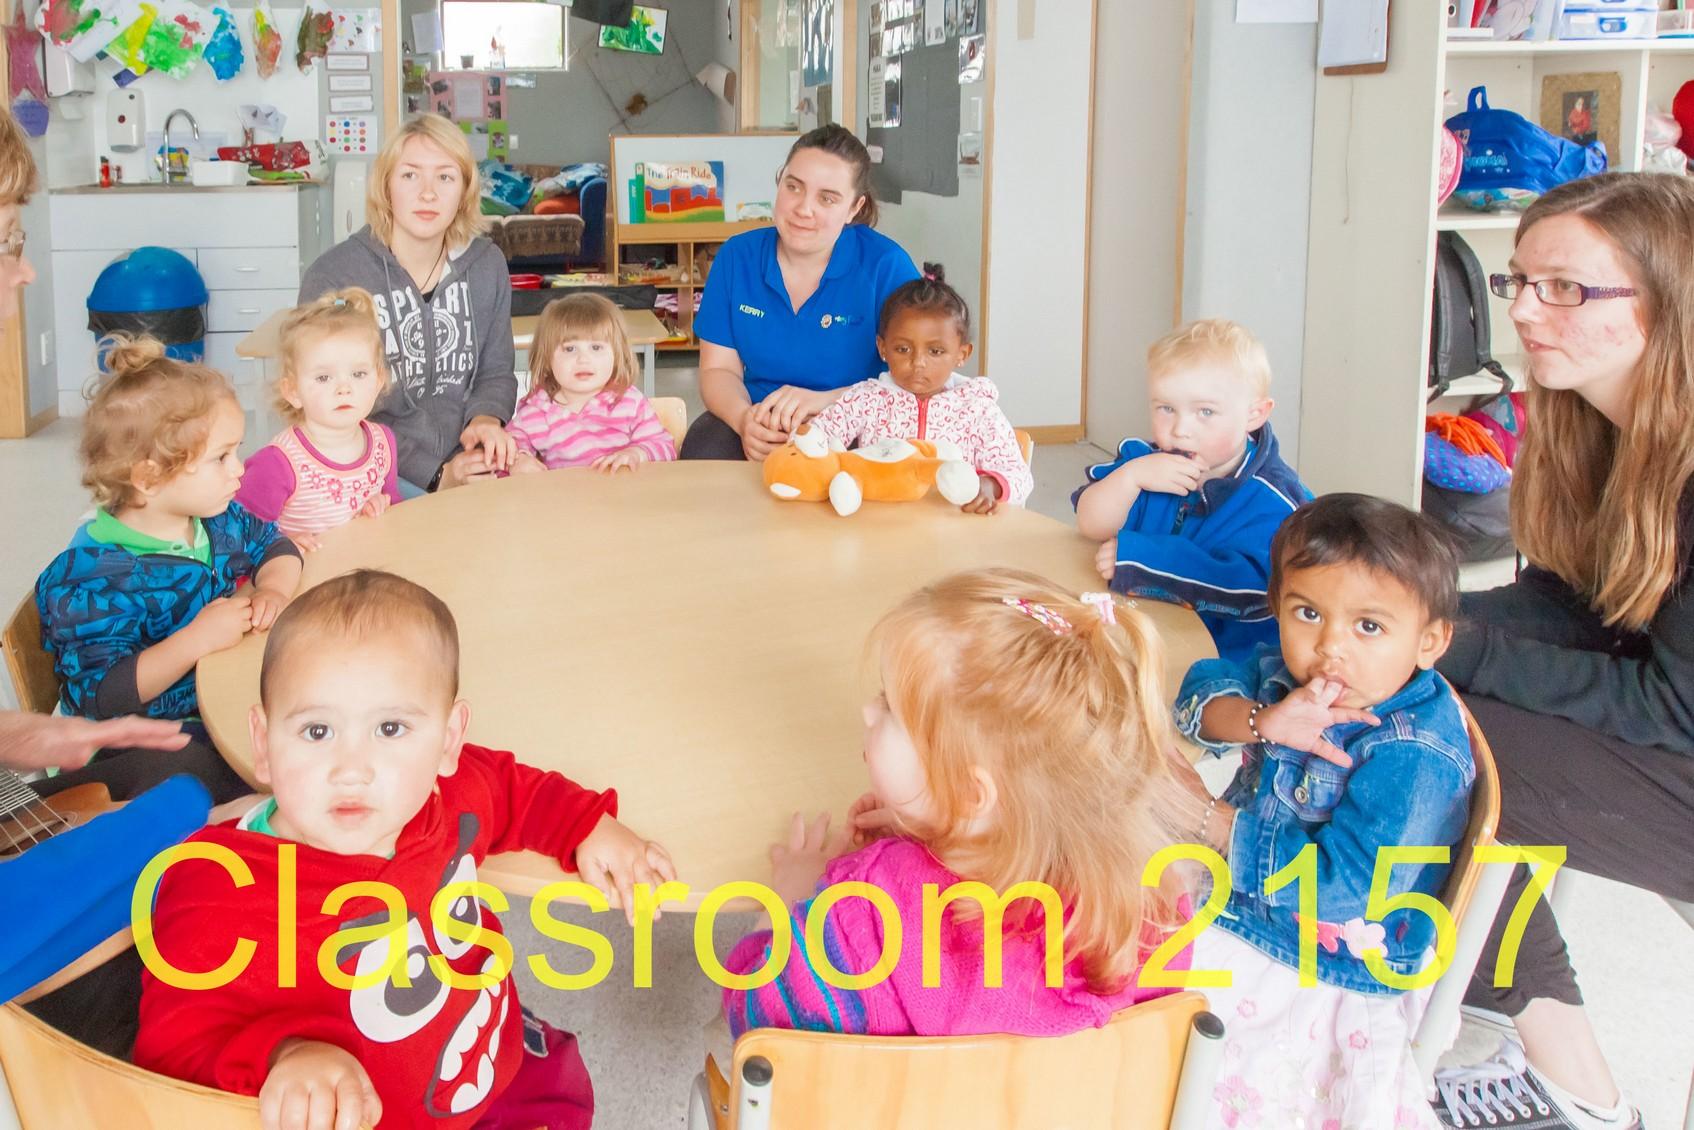 Classroom 2157